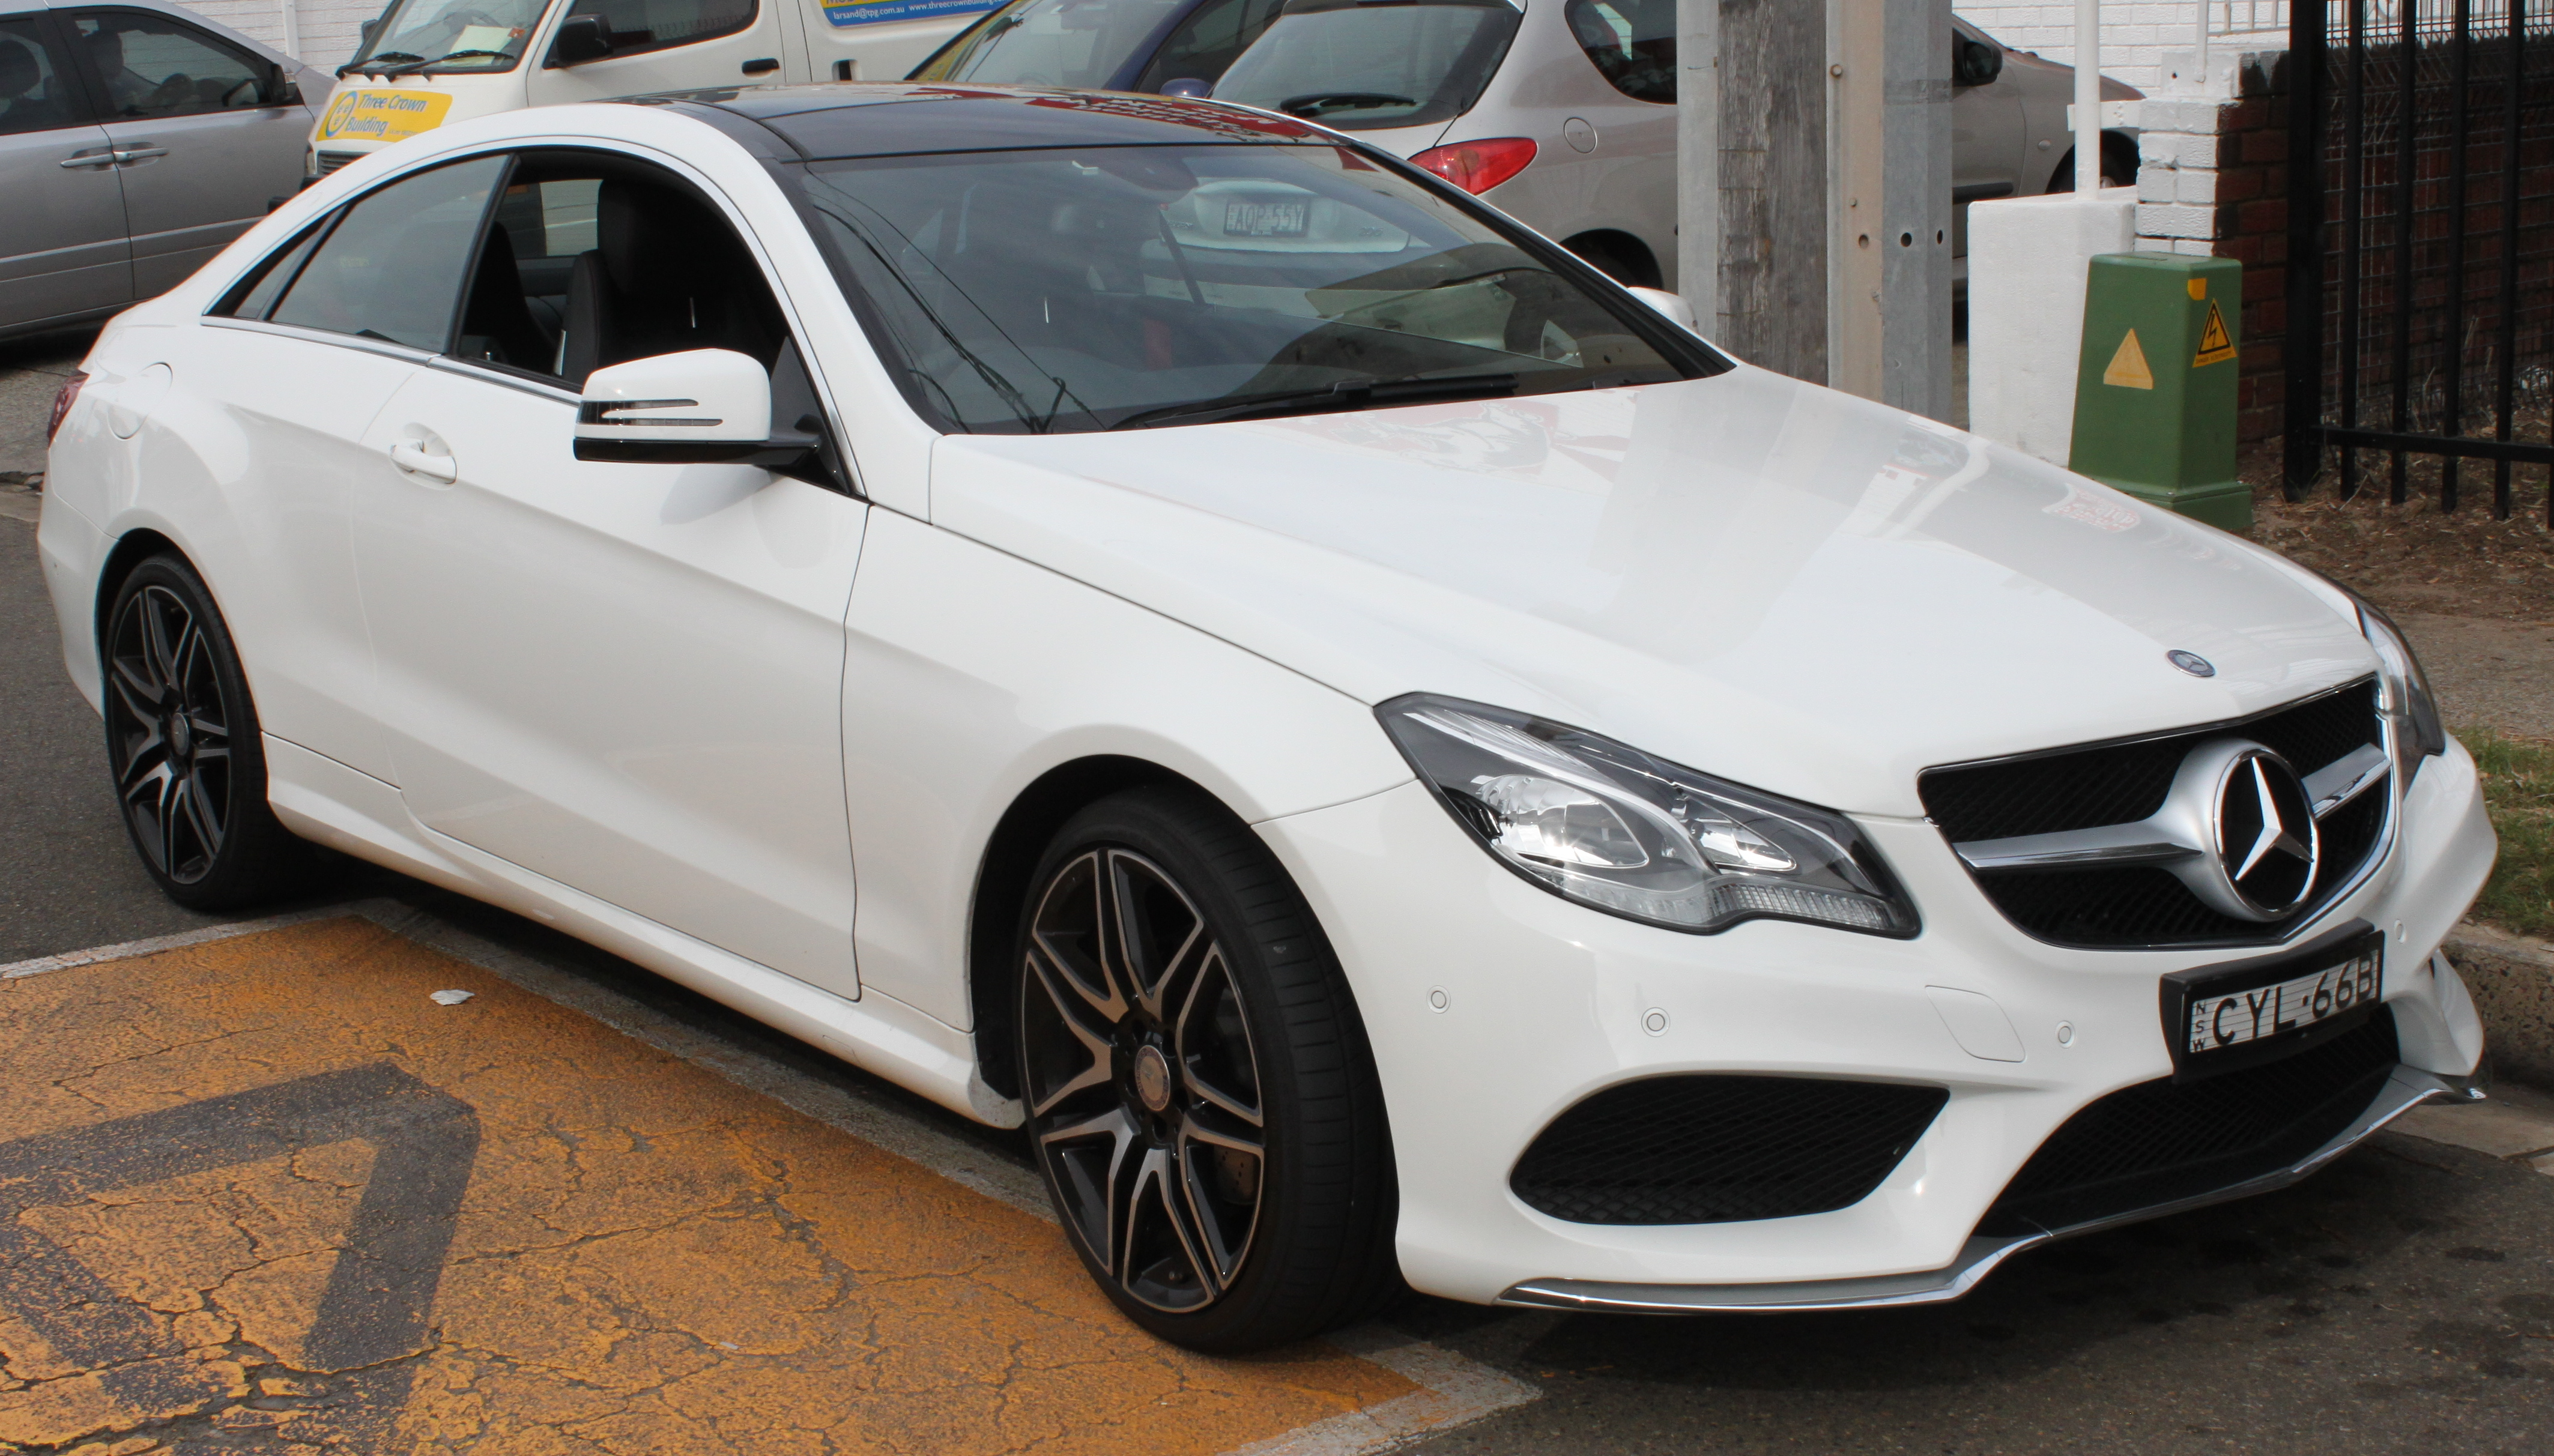 File:2014 Mercedes-Benz E 200 (C 207) coupe (26521312744 ...